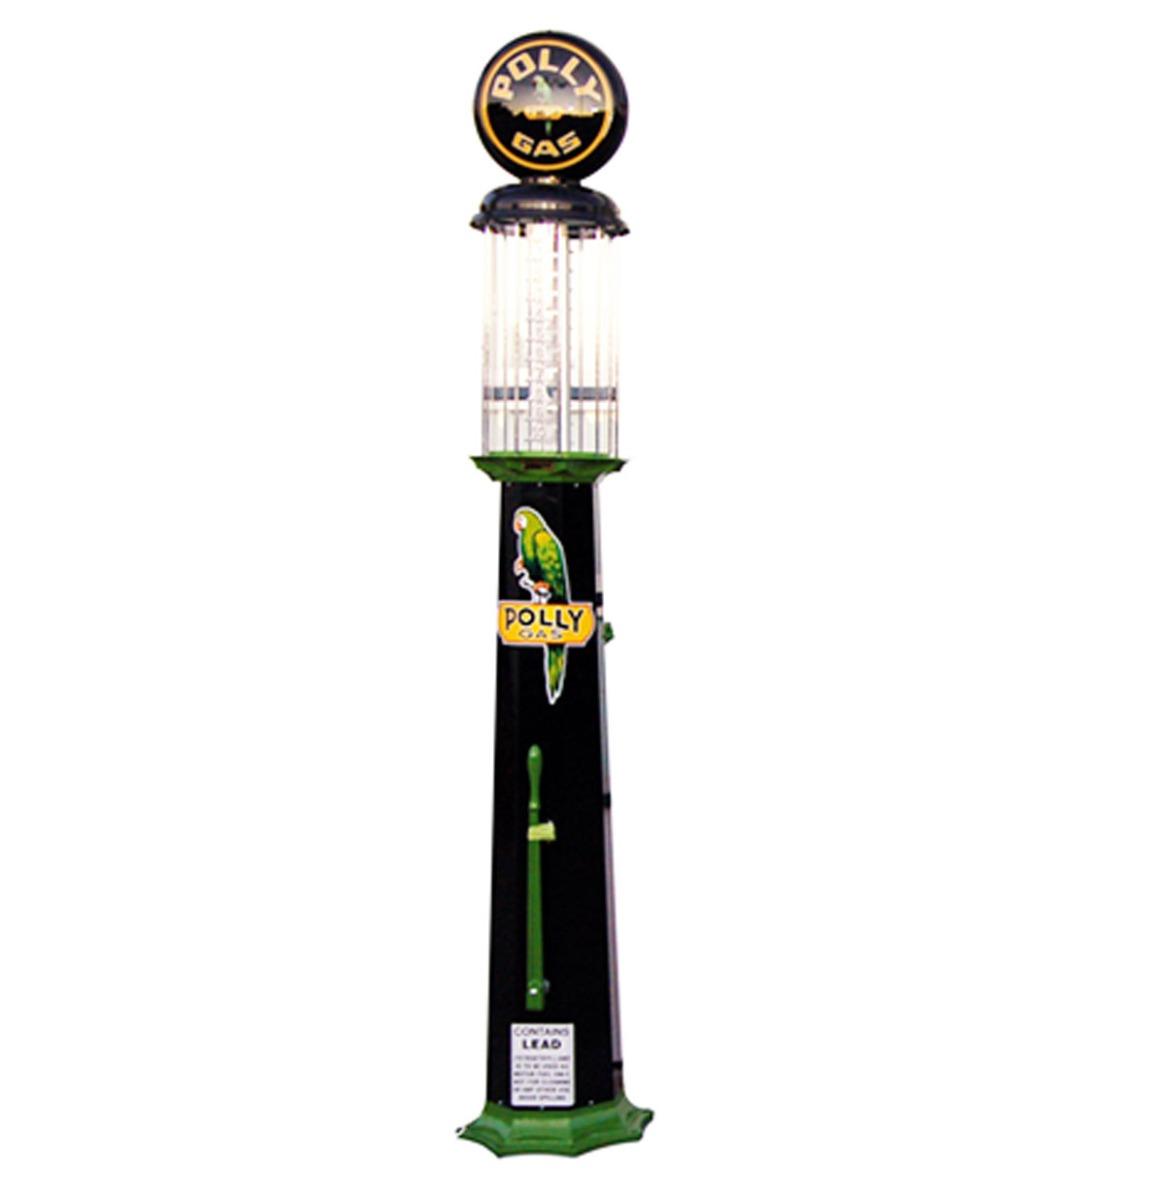 American Polly Gas 10 Gallon Benzinepomp - Zwart & Groen - Reproductie